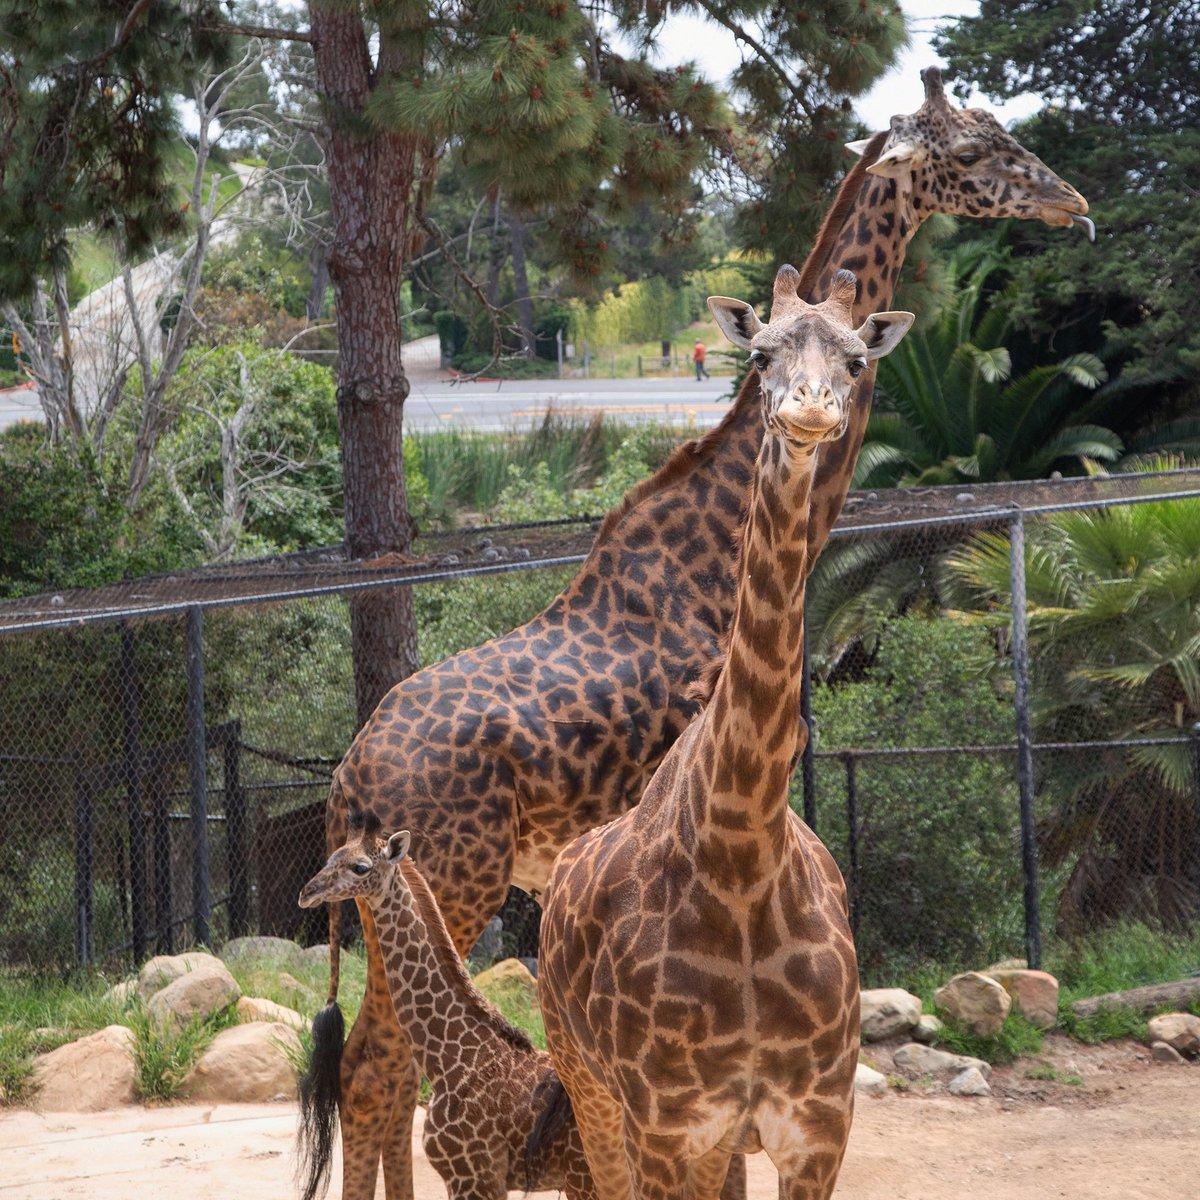 Spot the #TongueOutTuesday in this tall trio   . . #giraffe #giraffesofinstagram #giraffes #santabarbarazoo #giraffelove #babyanimal #babyanimals #cuteanimal #adorableanimalspic.twitter.com/mwHtAEvMyS